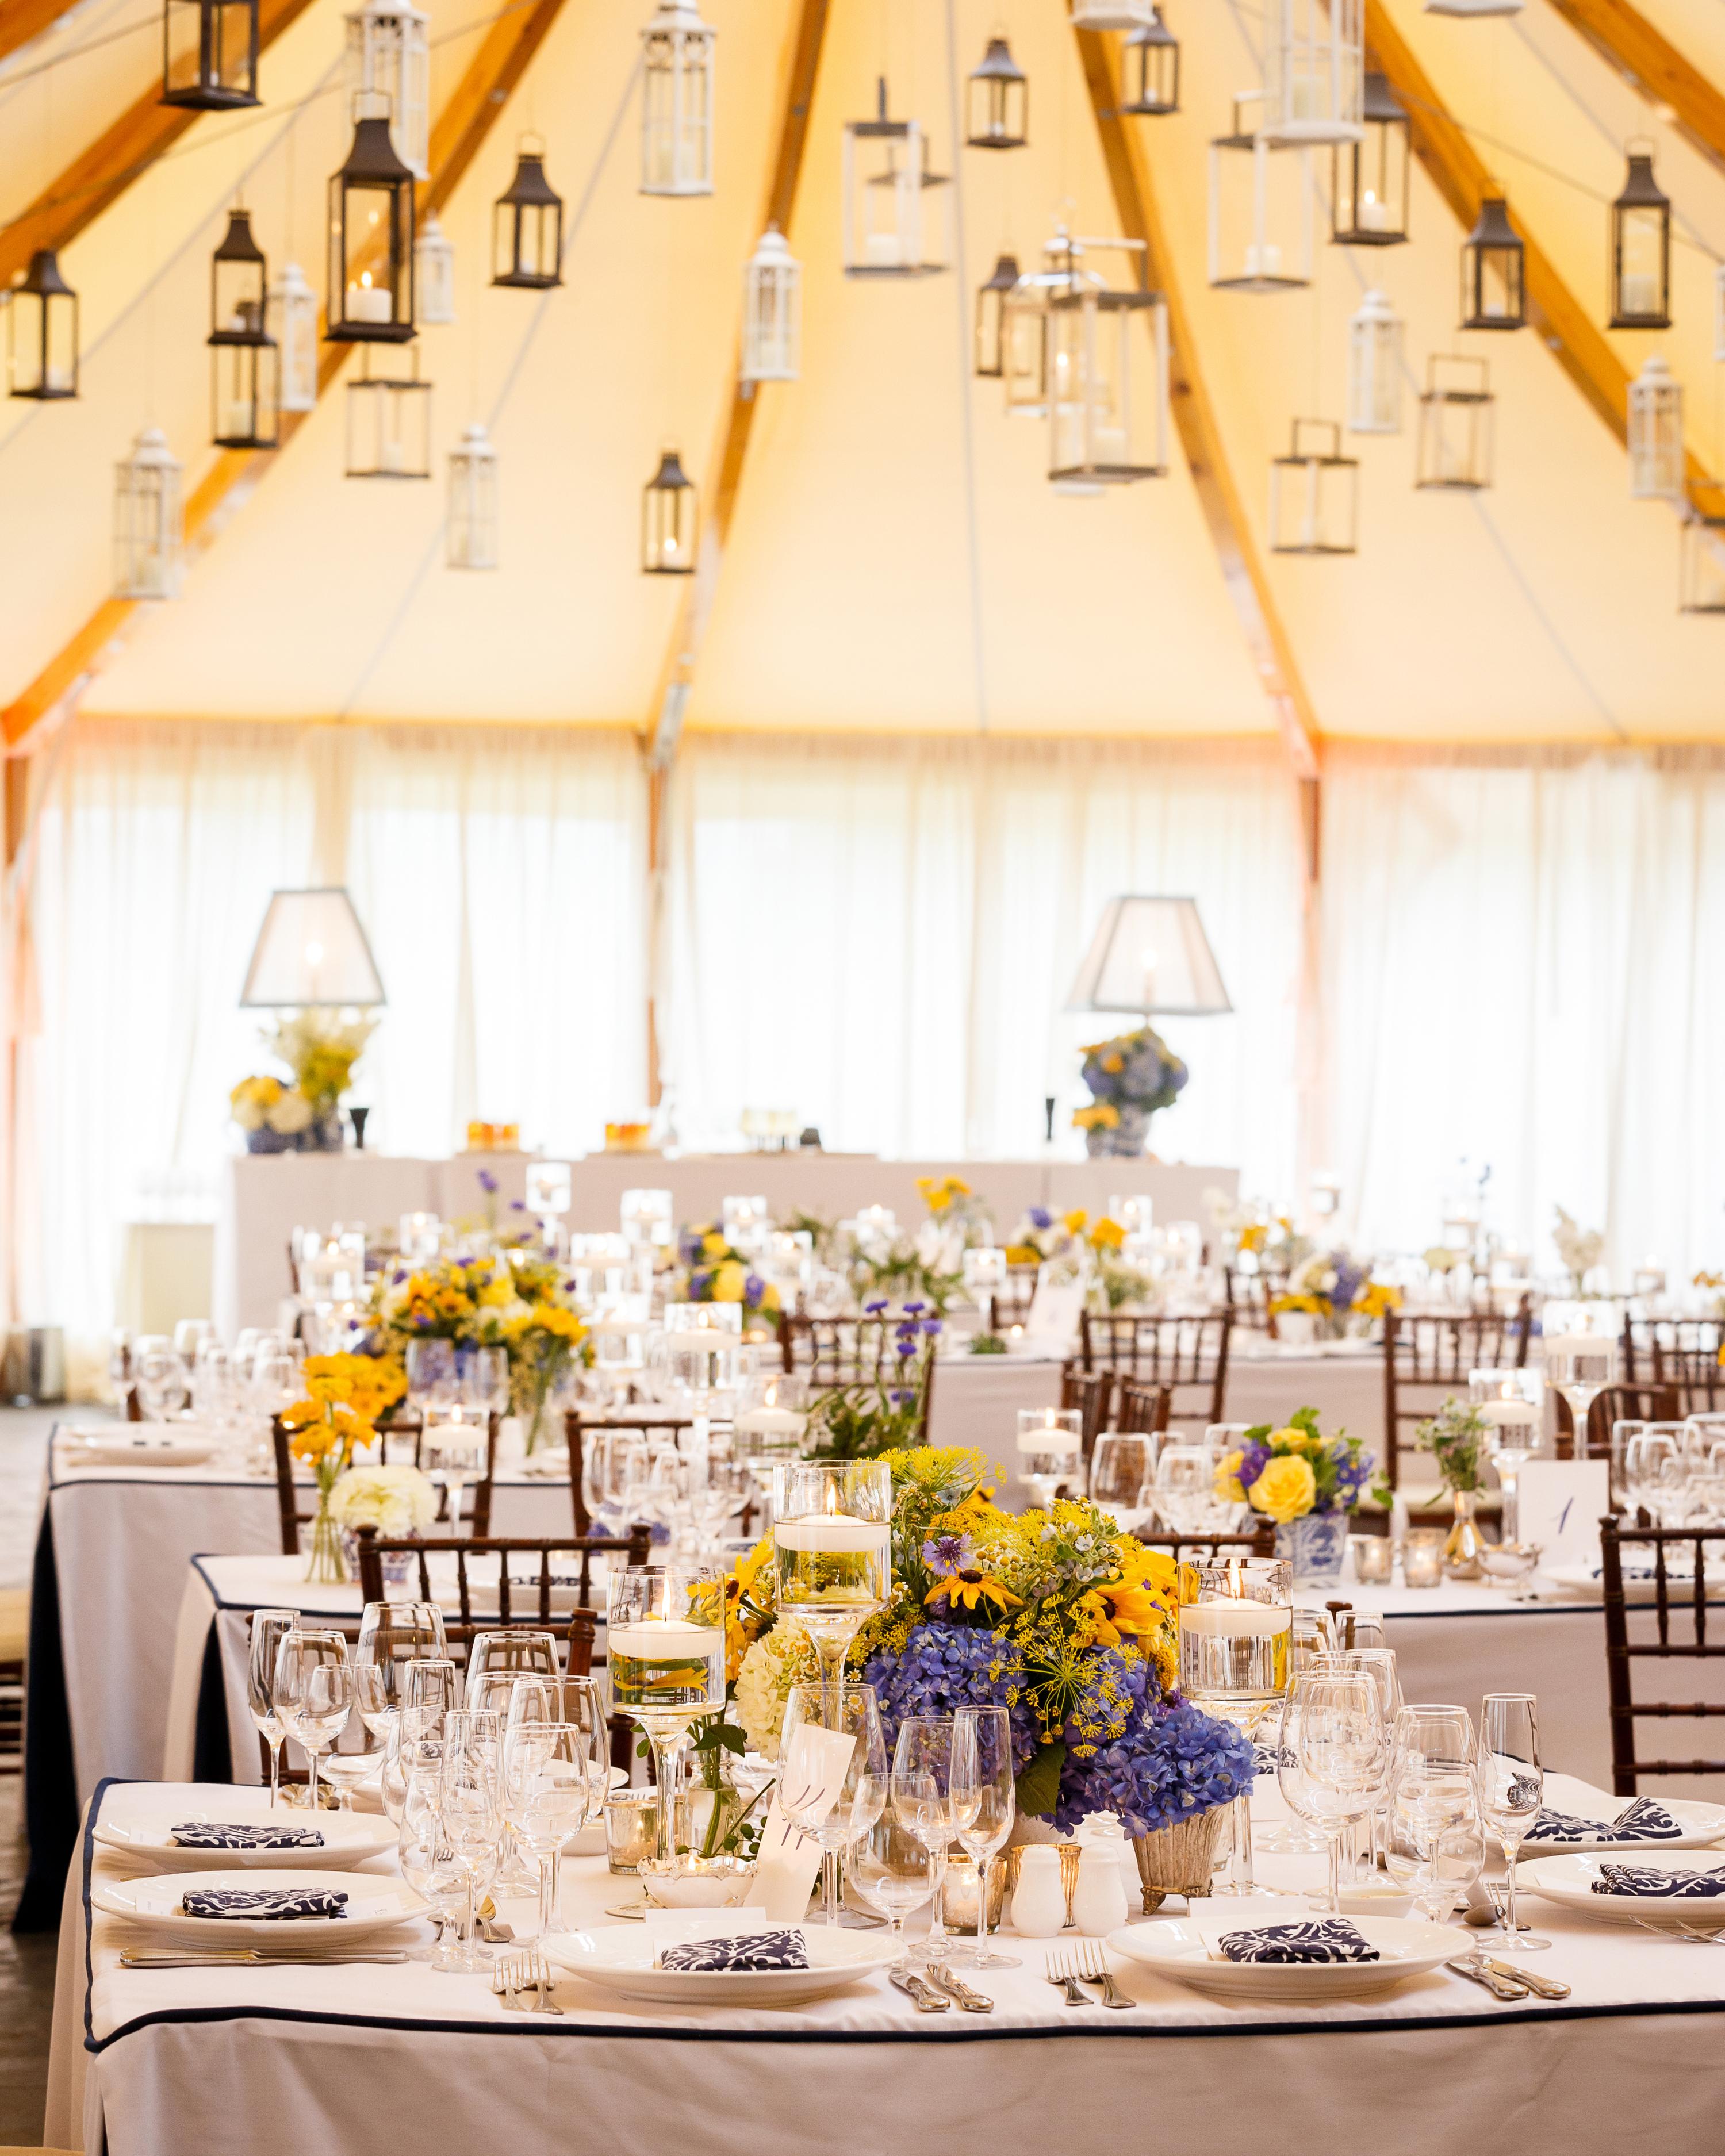 kristel-austin-wedding-table-0969-s11860-0415.jpg